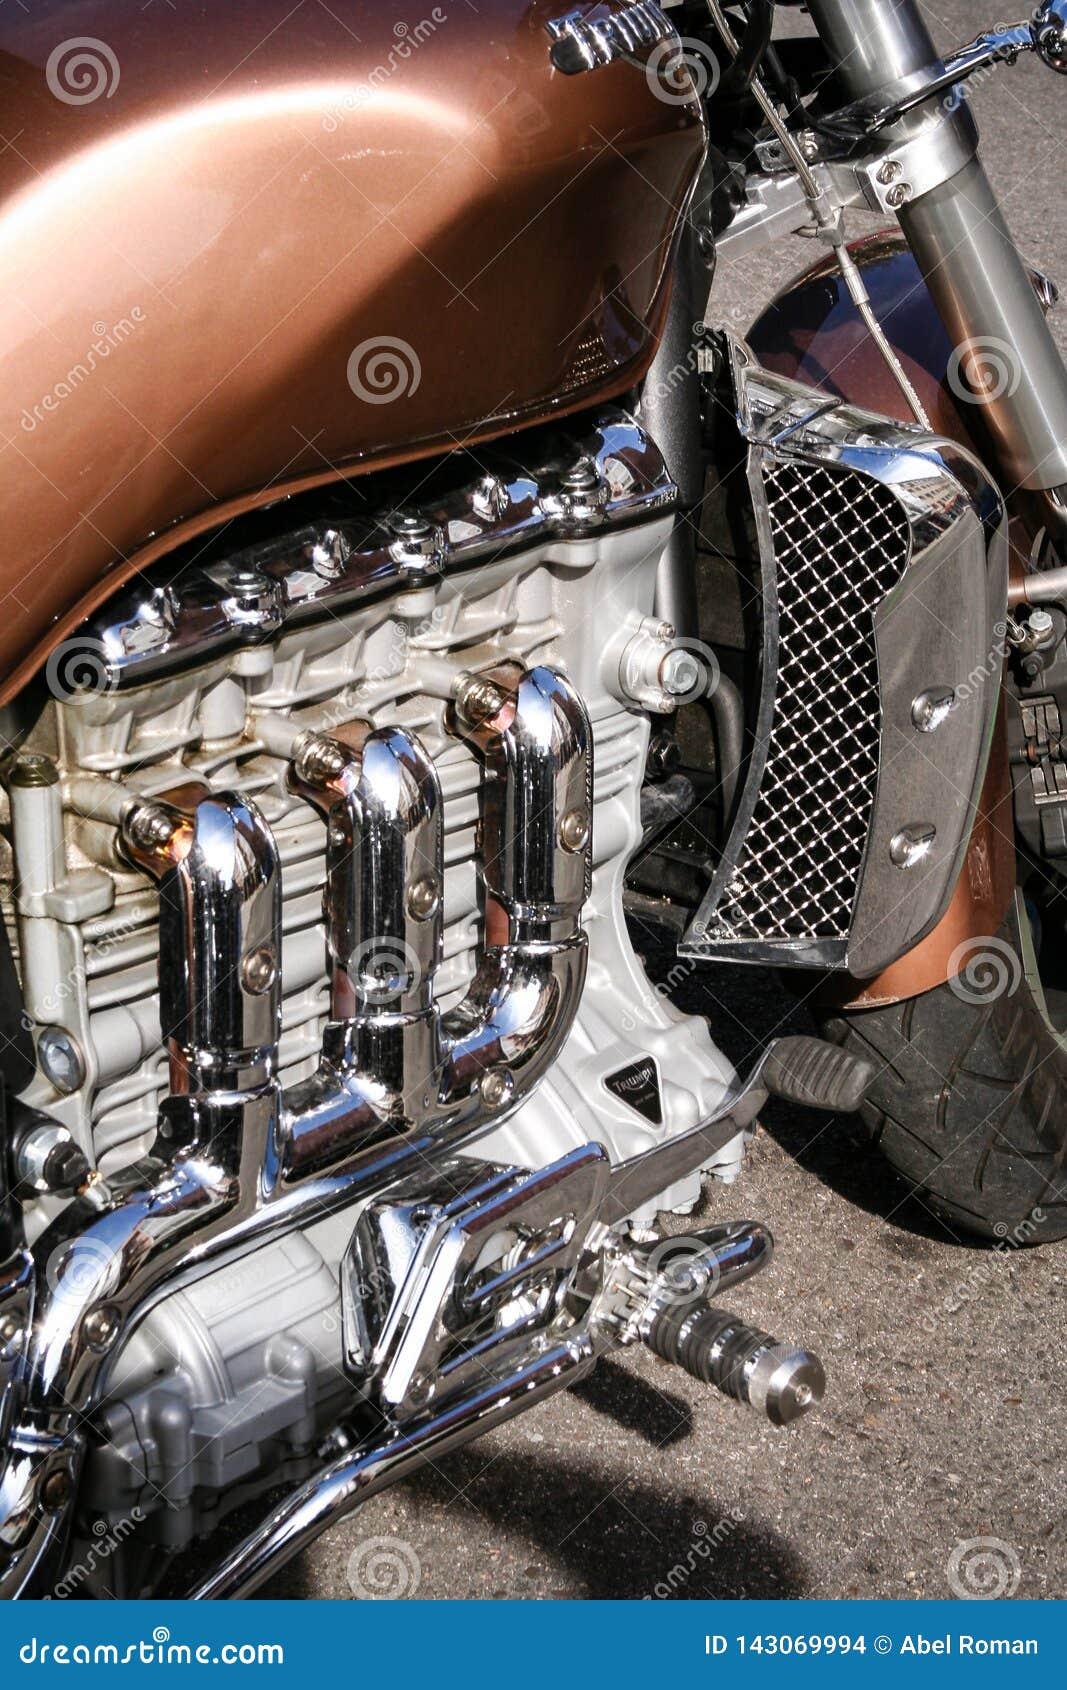 Engine of a Motorbike